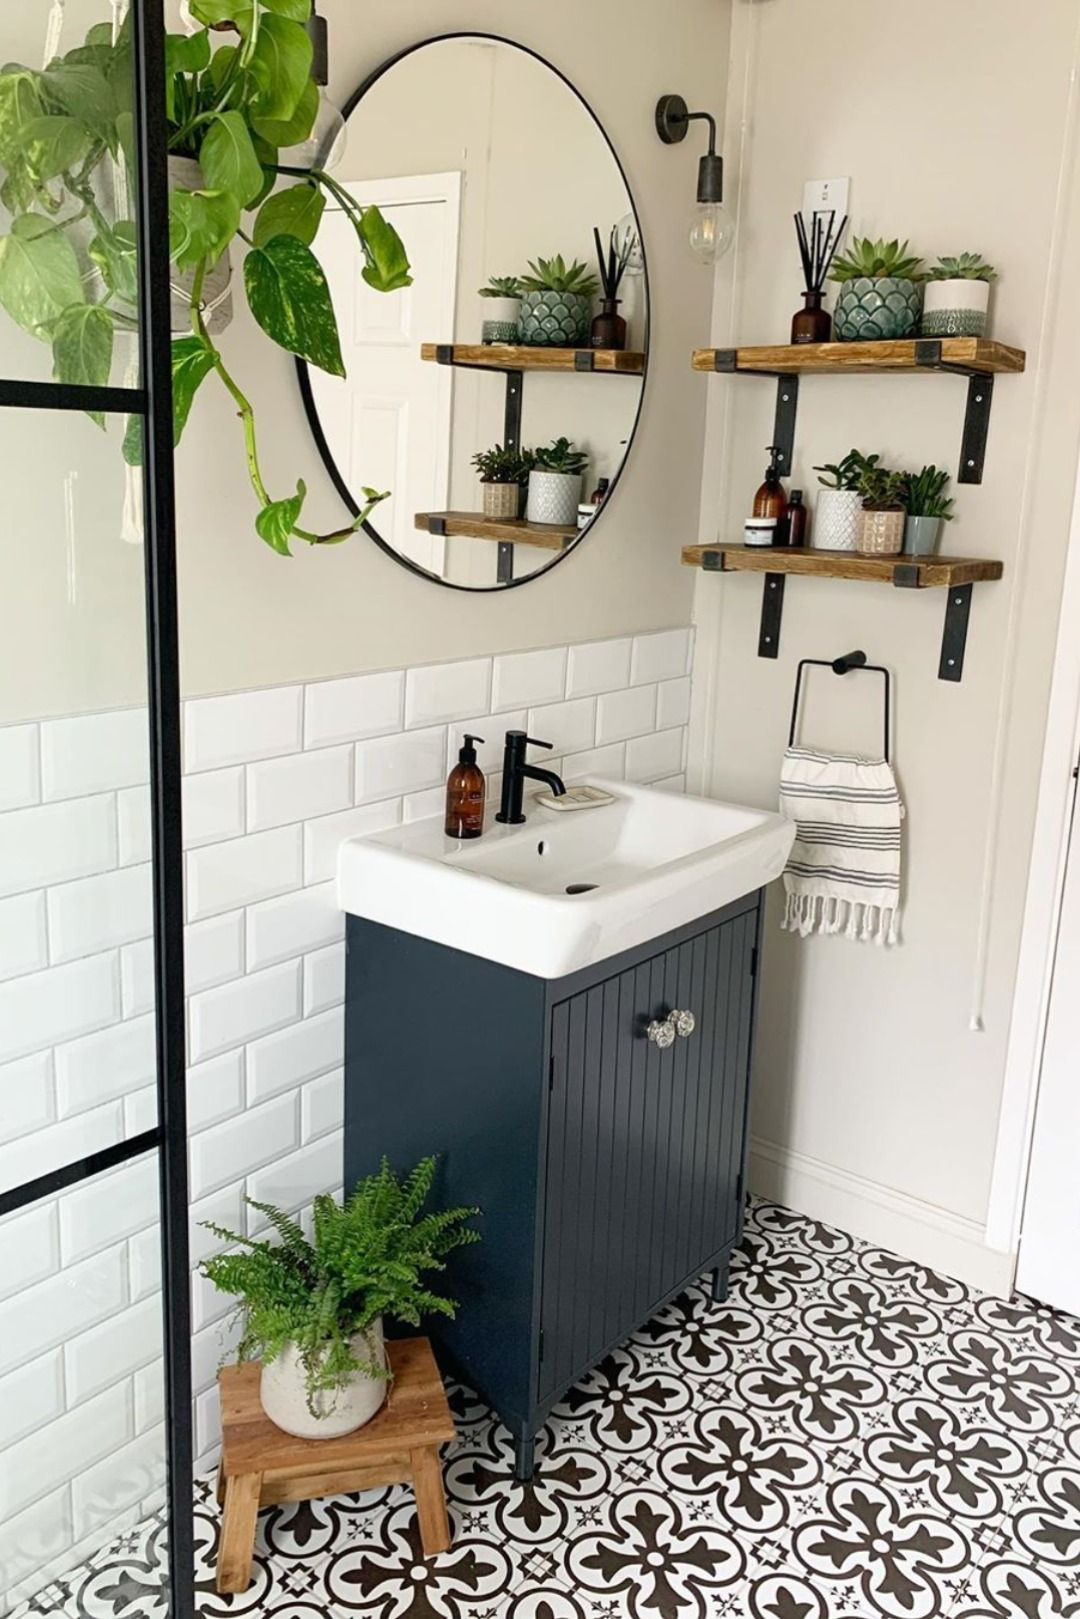 12+ Credence salle de bain lavabo inspirations